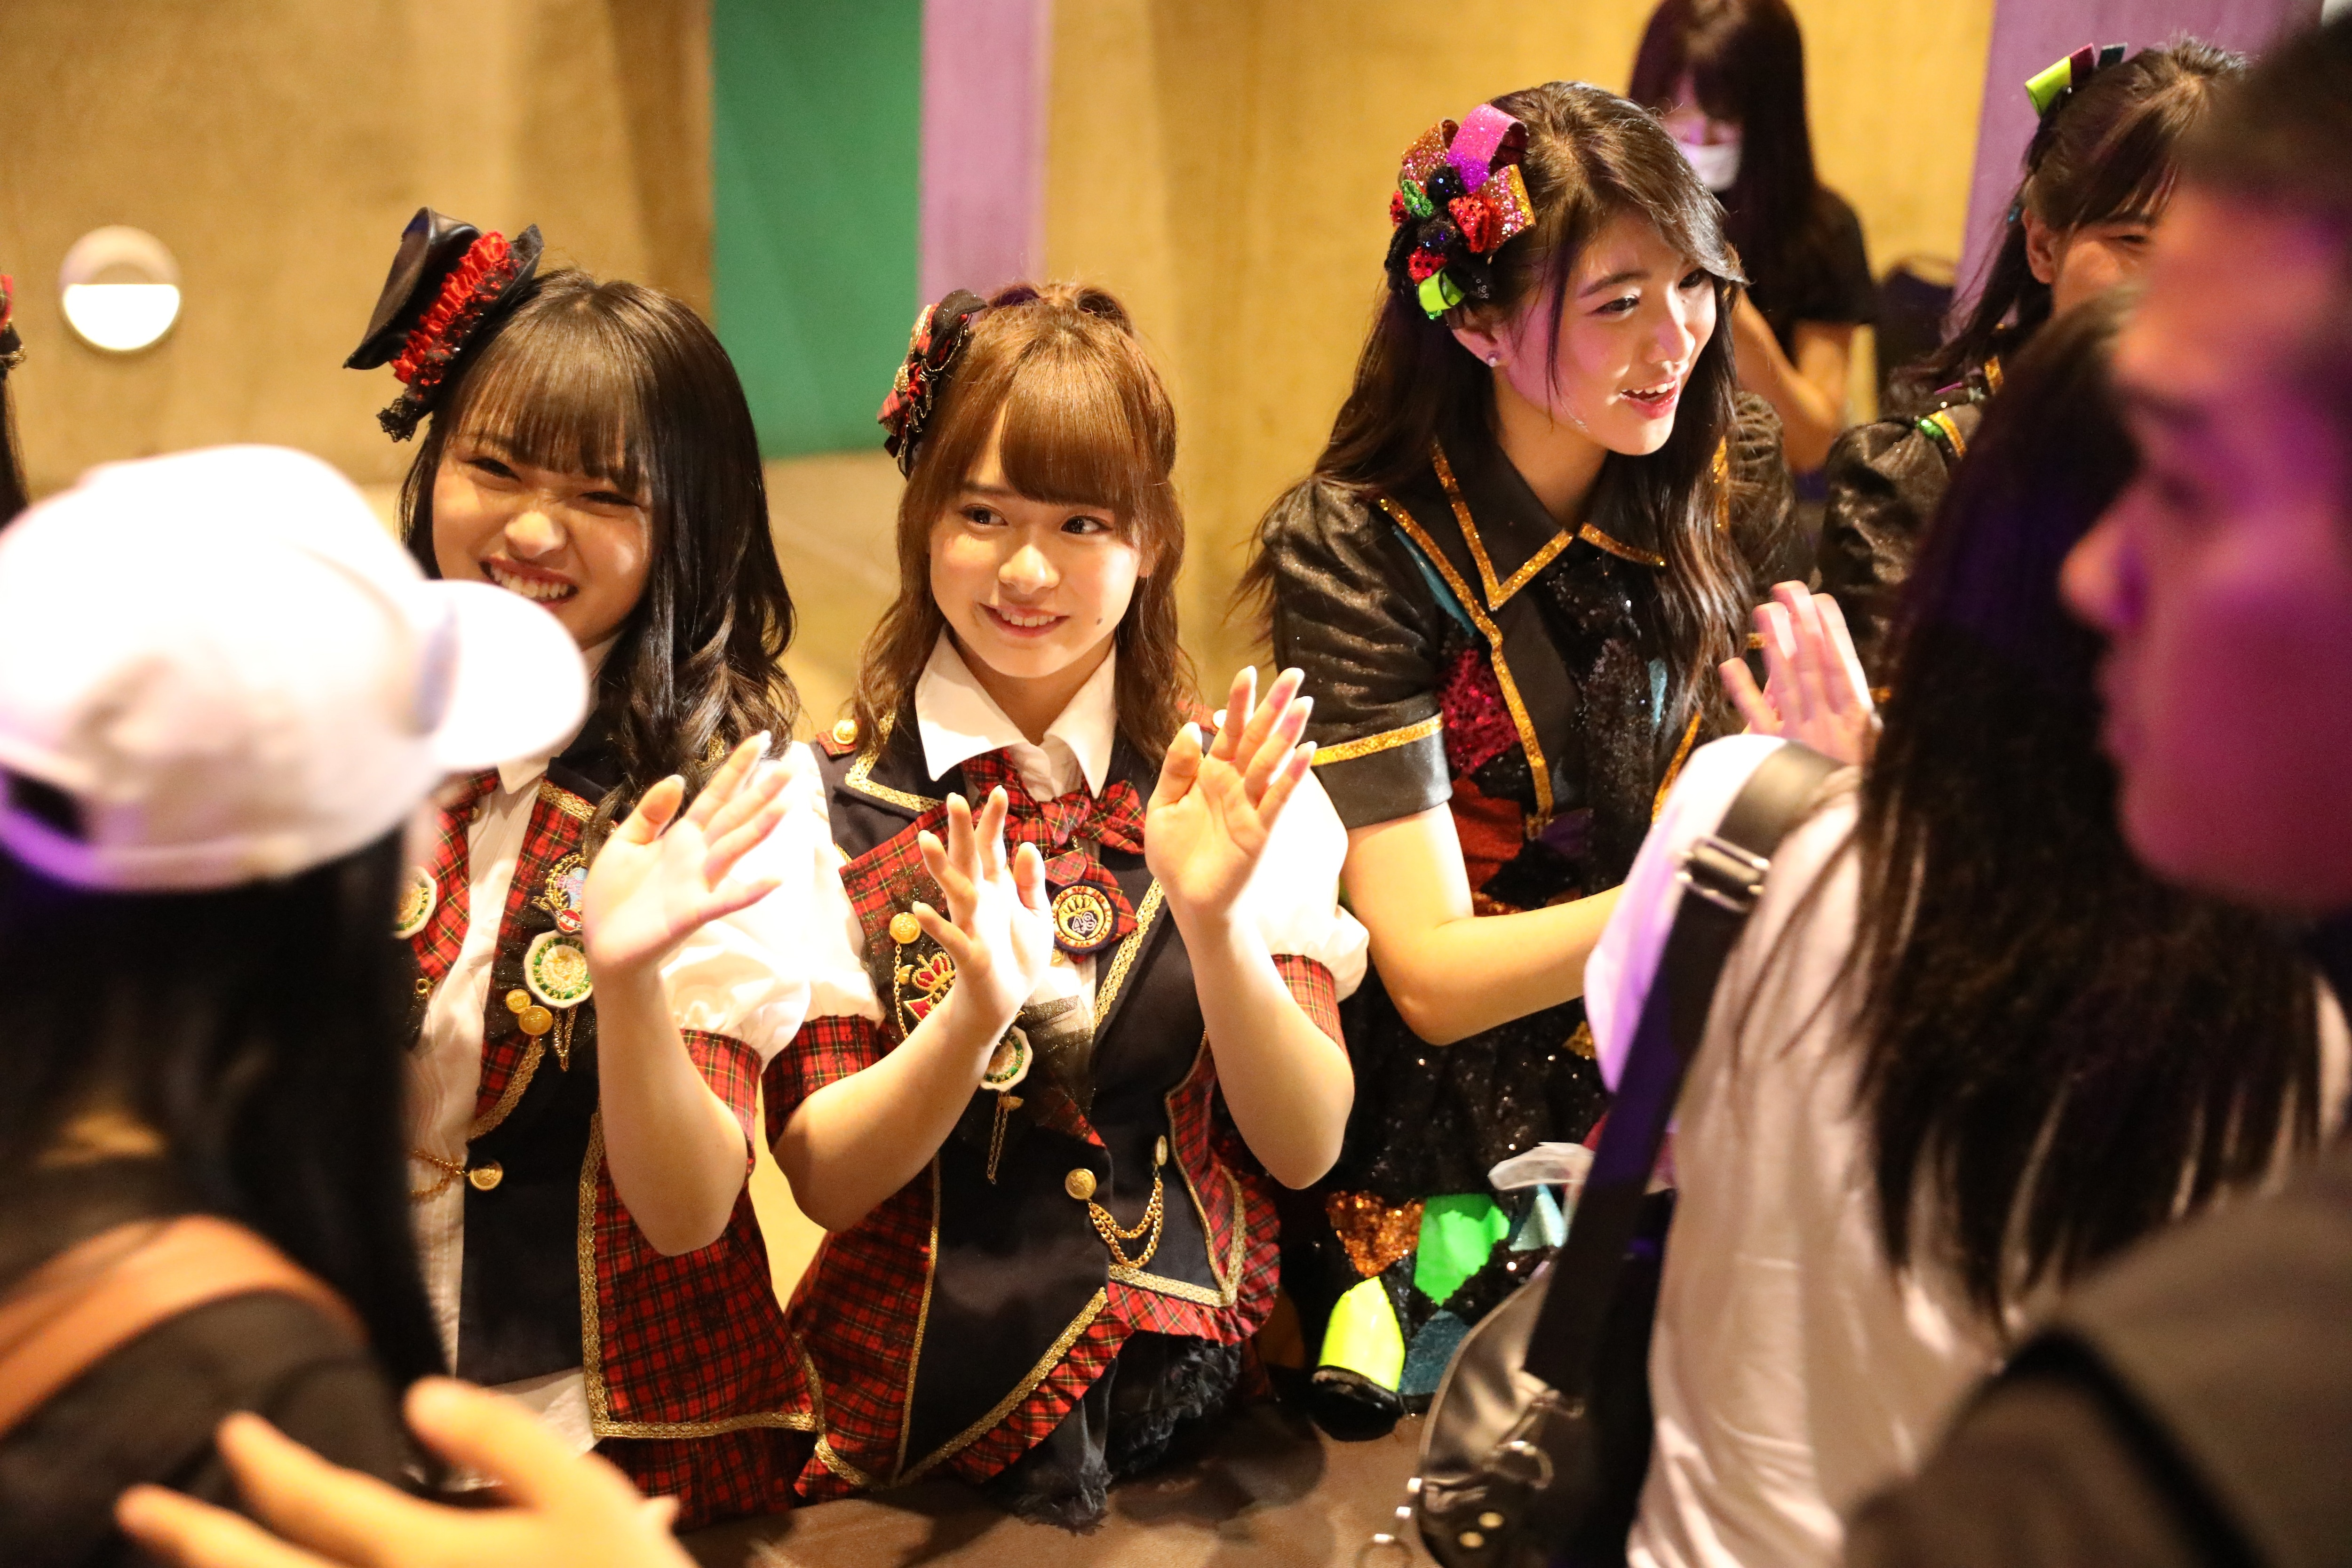 AKB48ほか、海外の姉妹グループが集結し『恋するフォーチュンクッキー』を熱唱!【写真23枚】の画像001